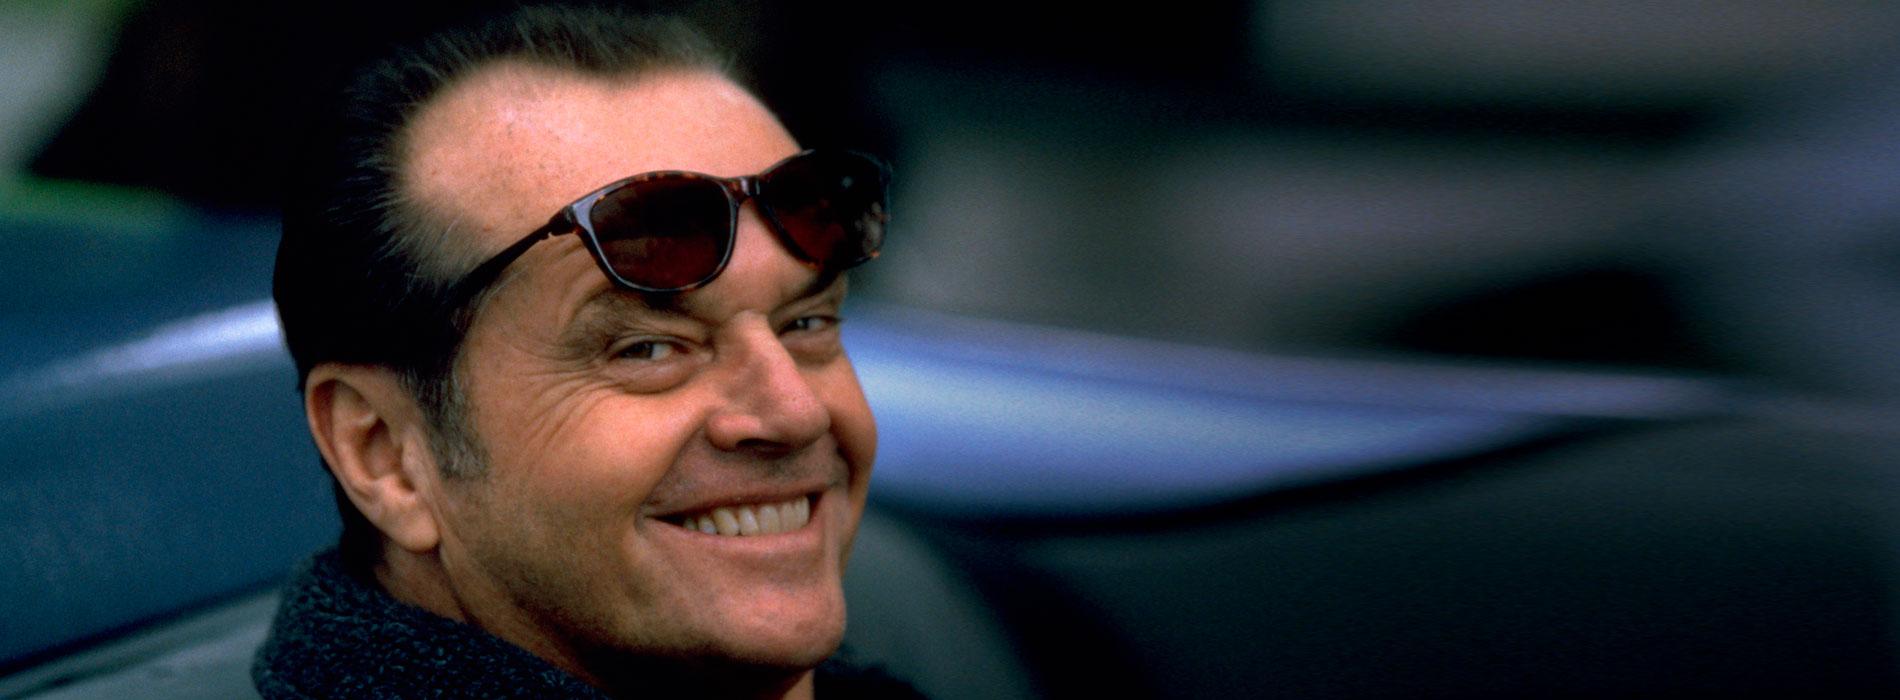 Jack Nicholson en Mejor imposible.